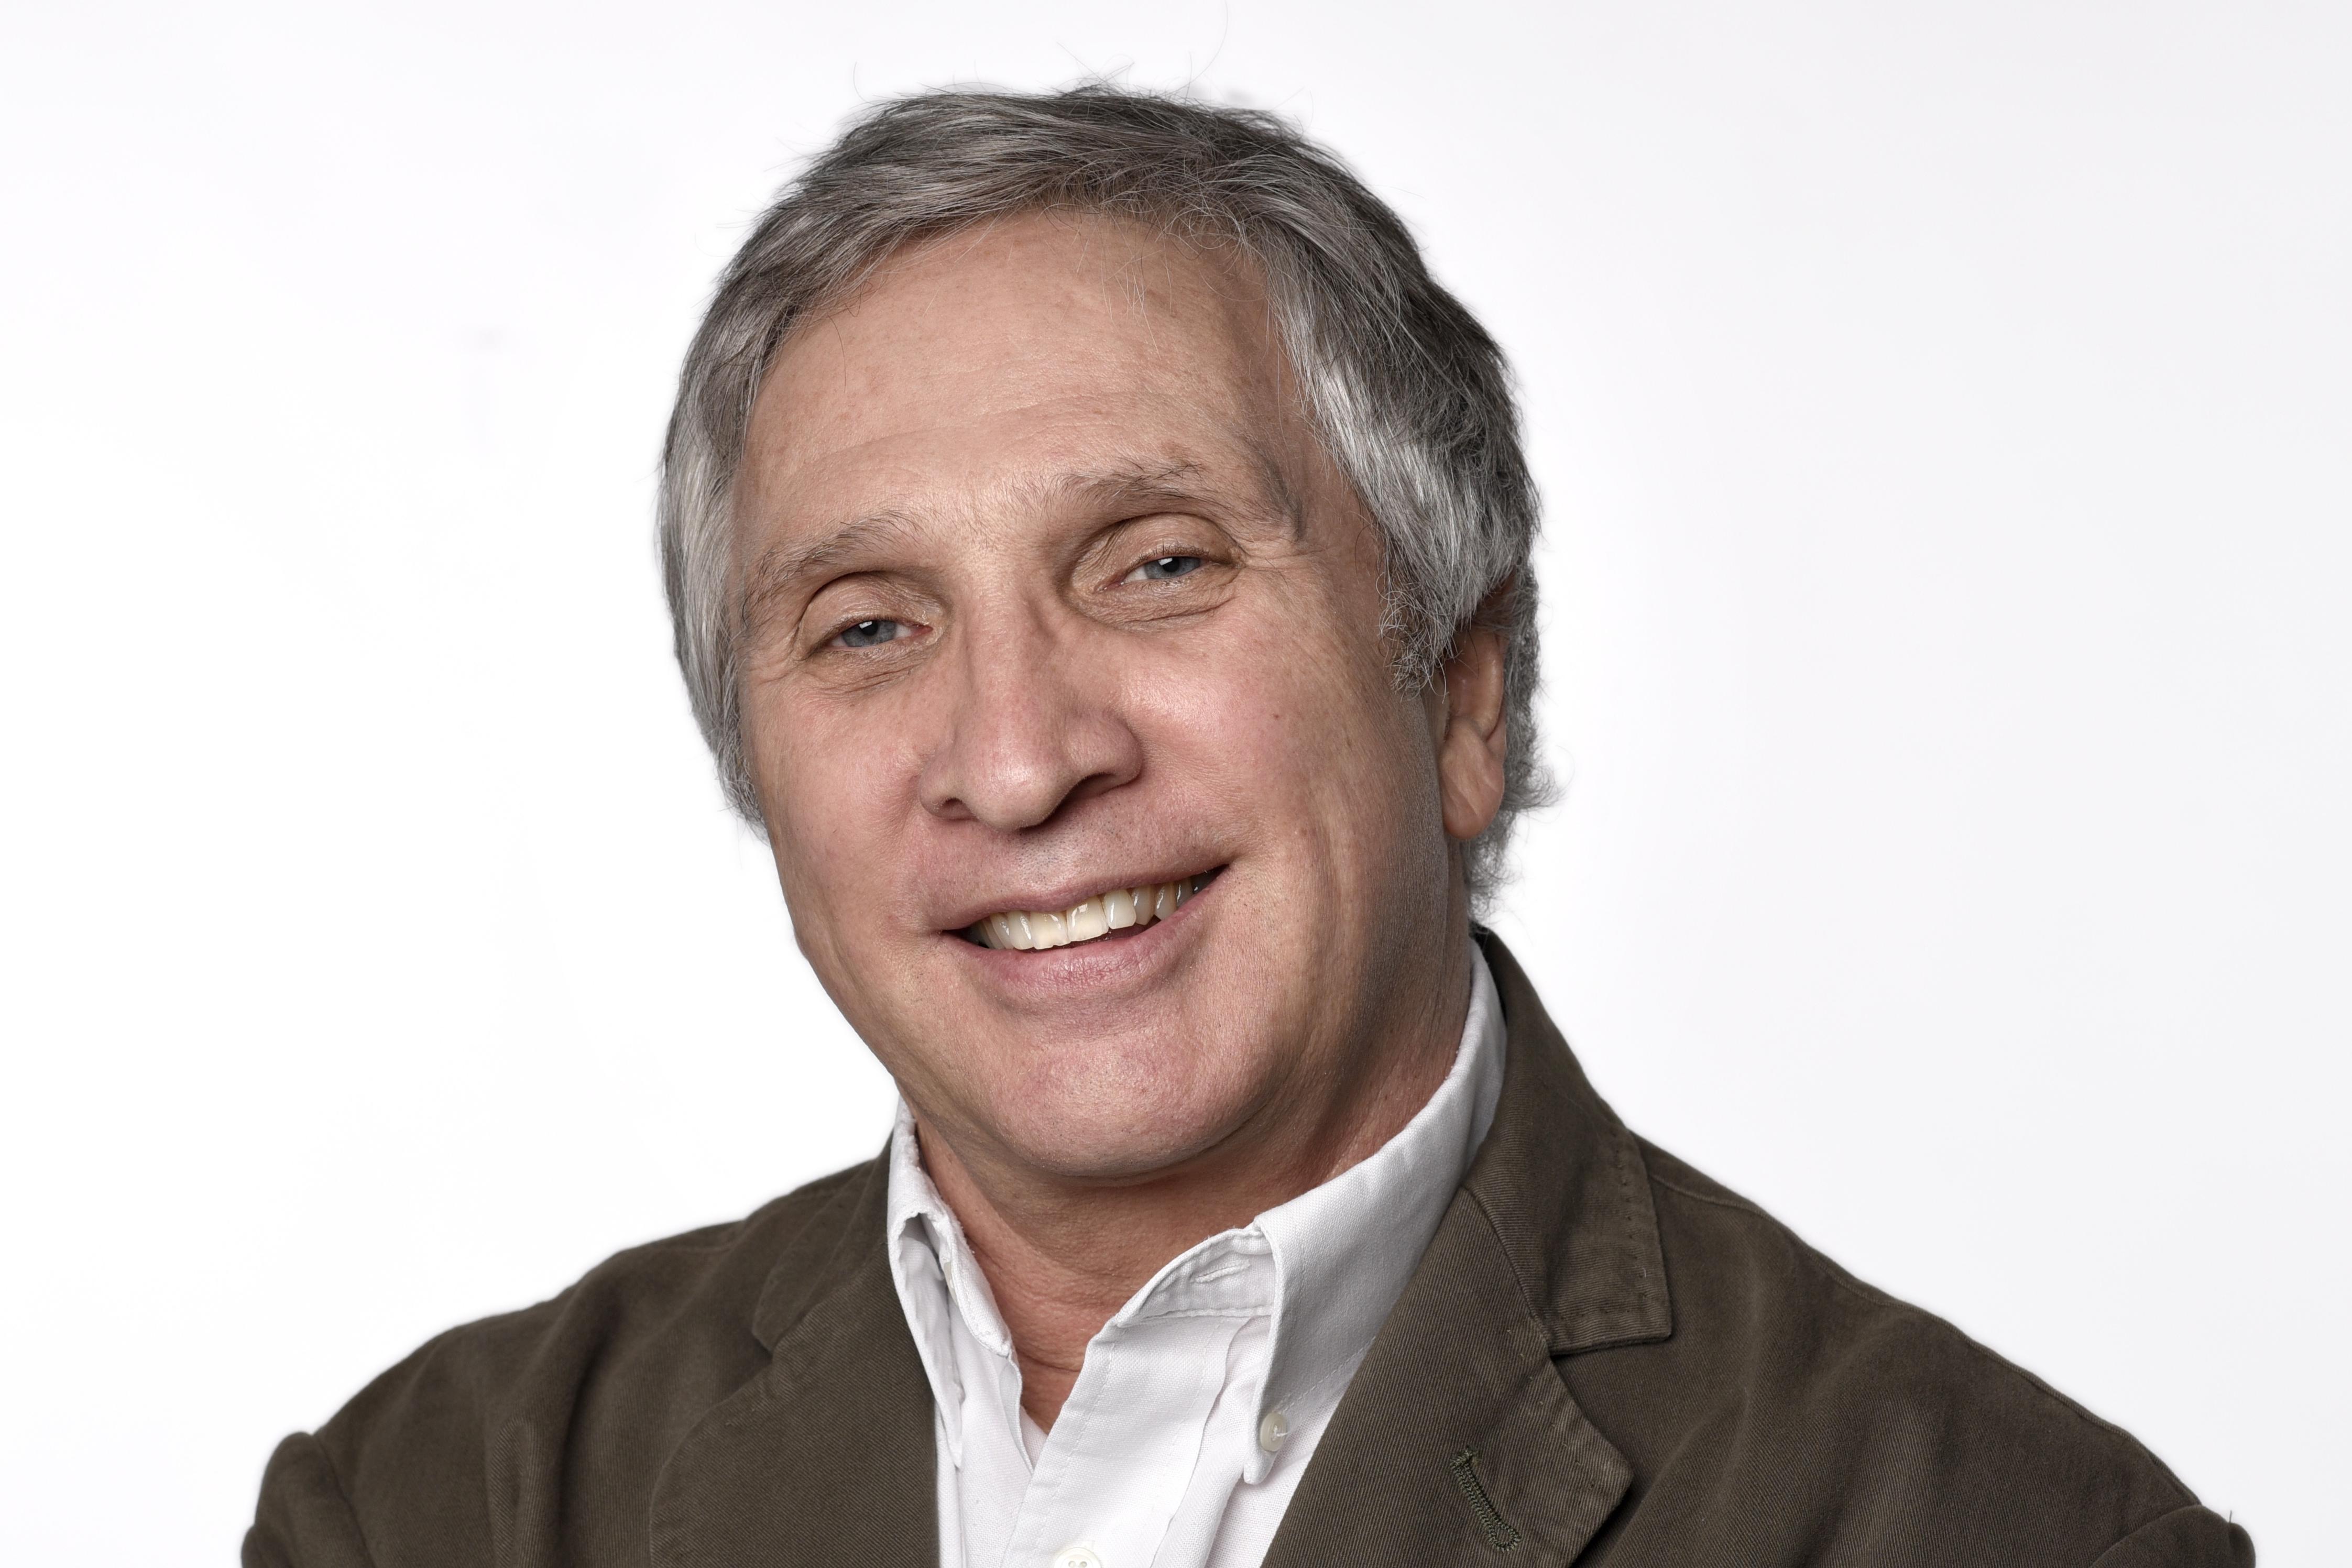 Peter Cheney